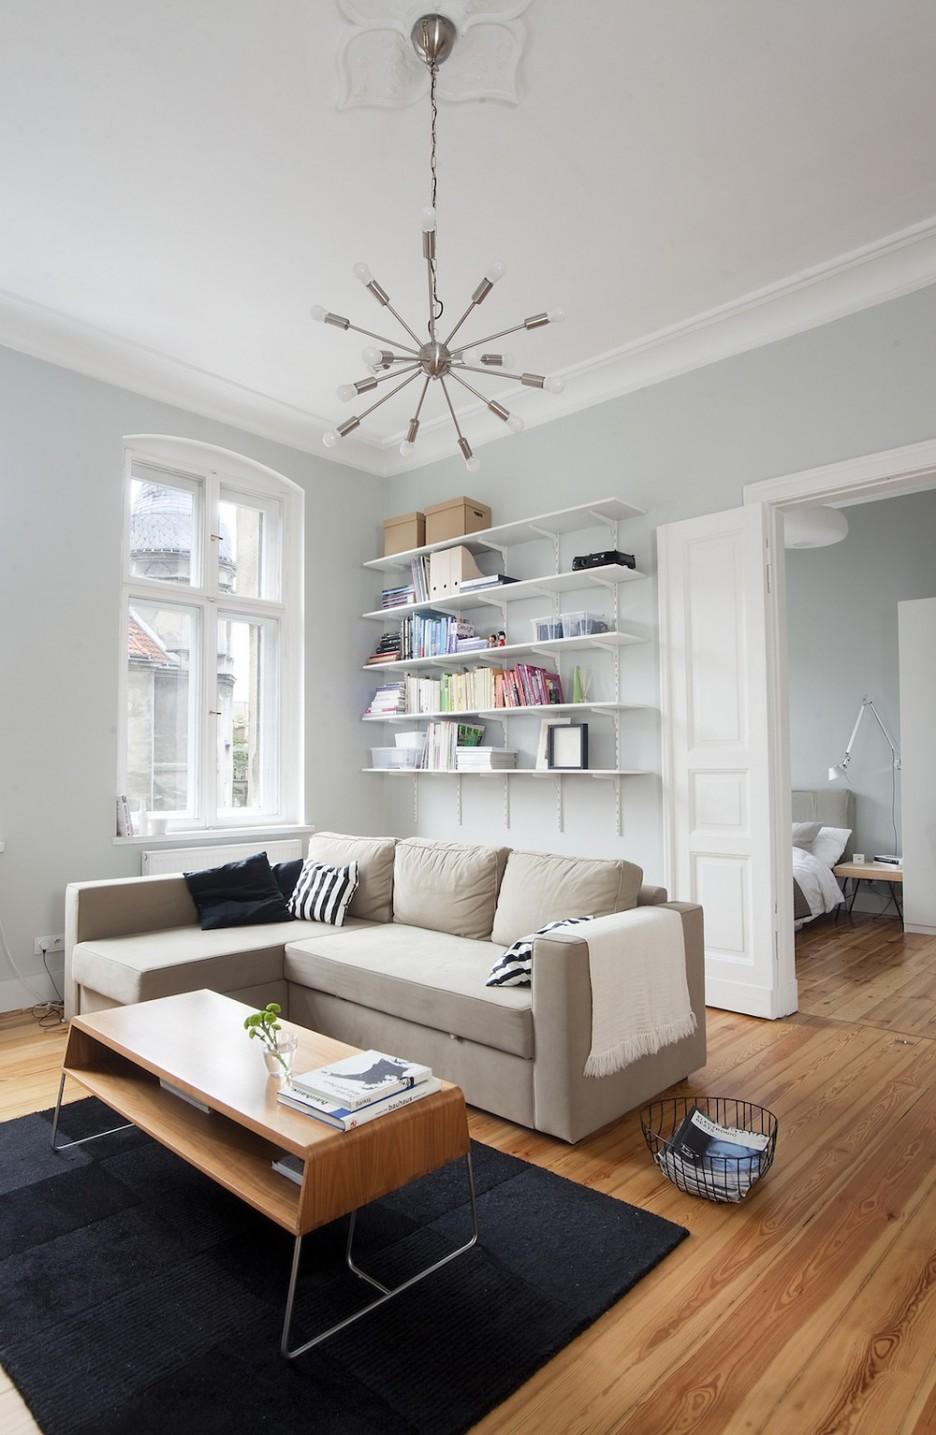 Interior design ideas architecture blog modern design for Apartment living room furniture